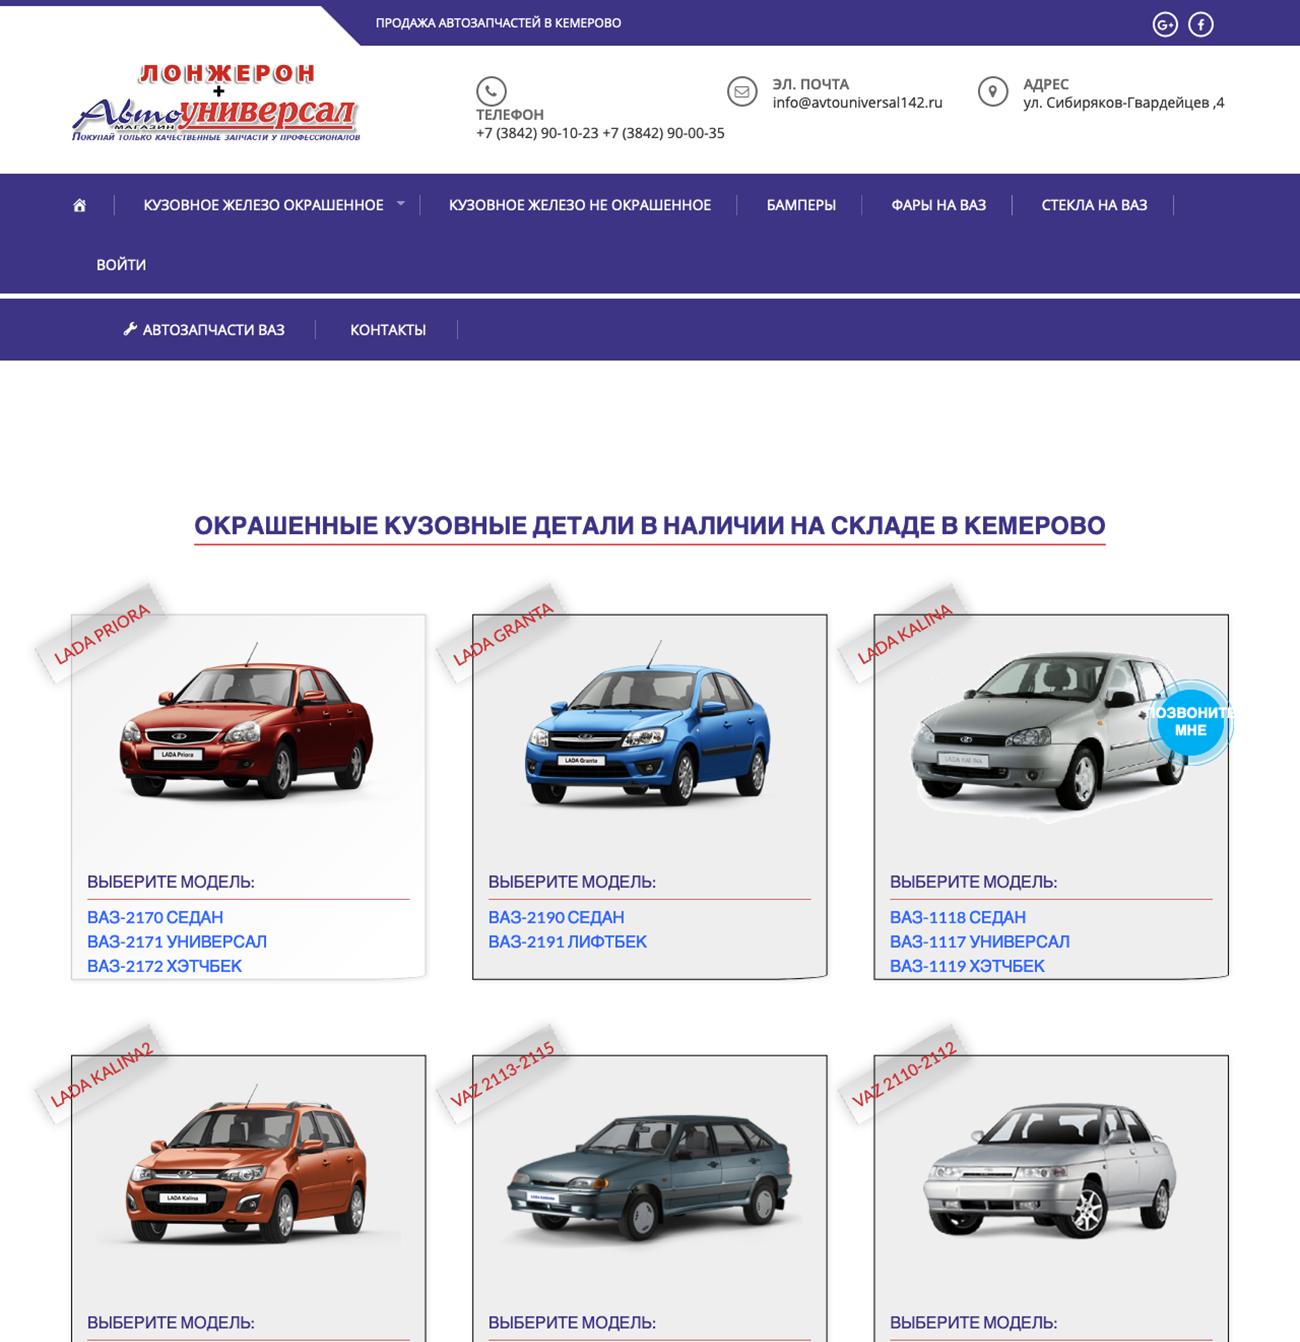 Продажа автозапчастей ВАЗ в Кемерово лендинг Пейдж